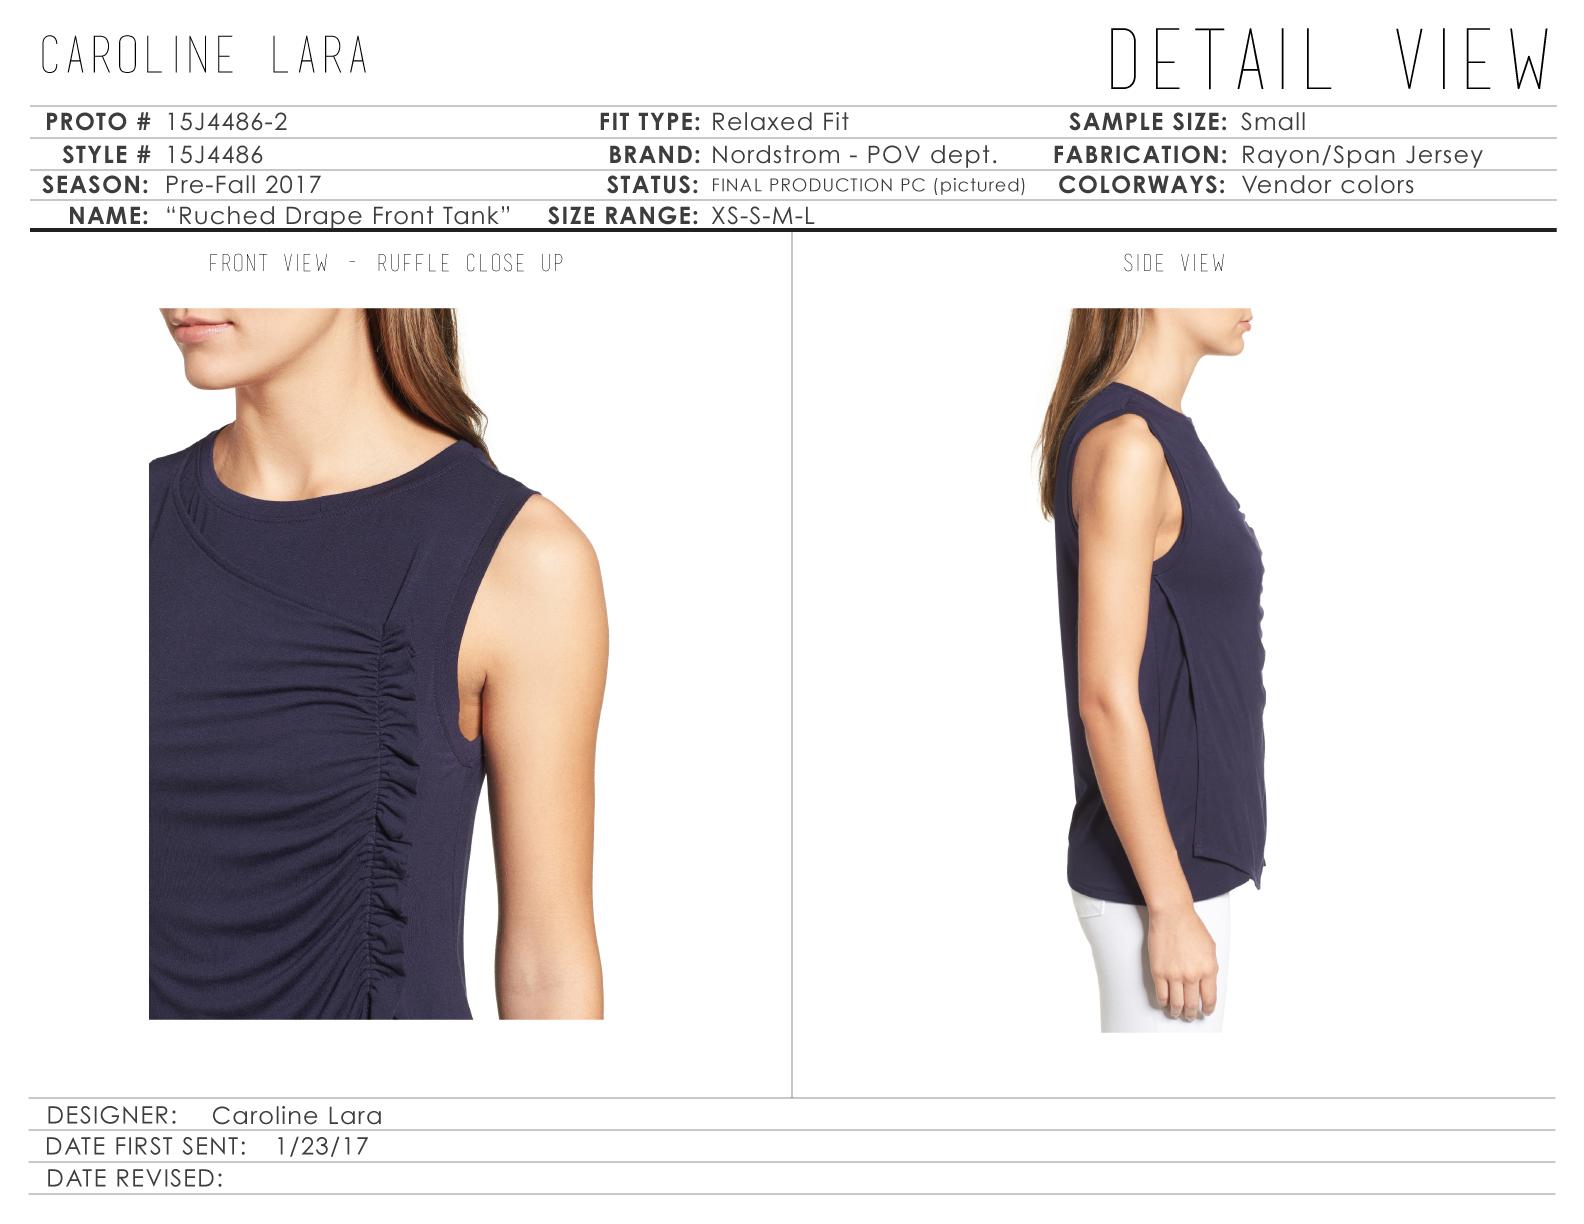 Caroline-Lara-Technical-Sketch-sample3.jpg